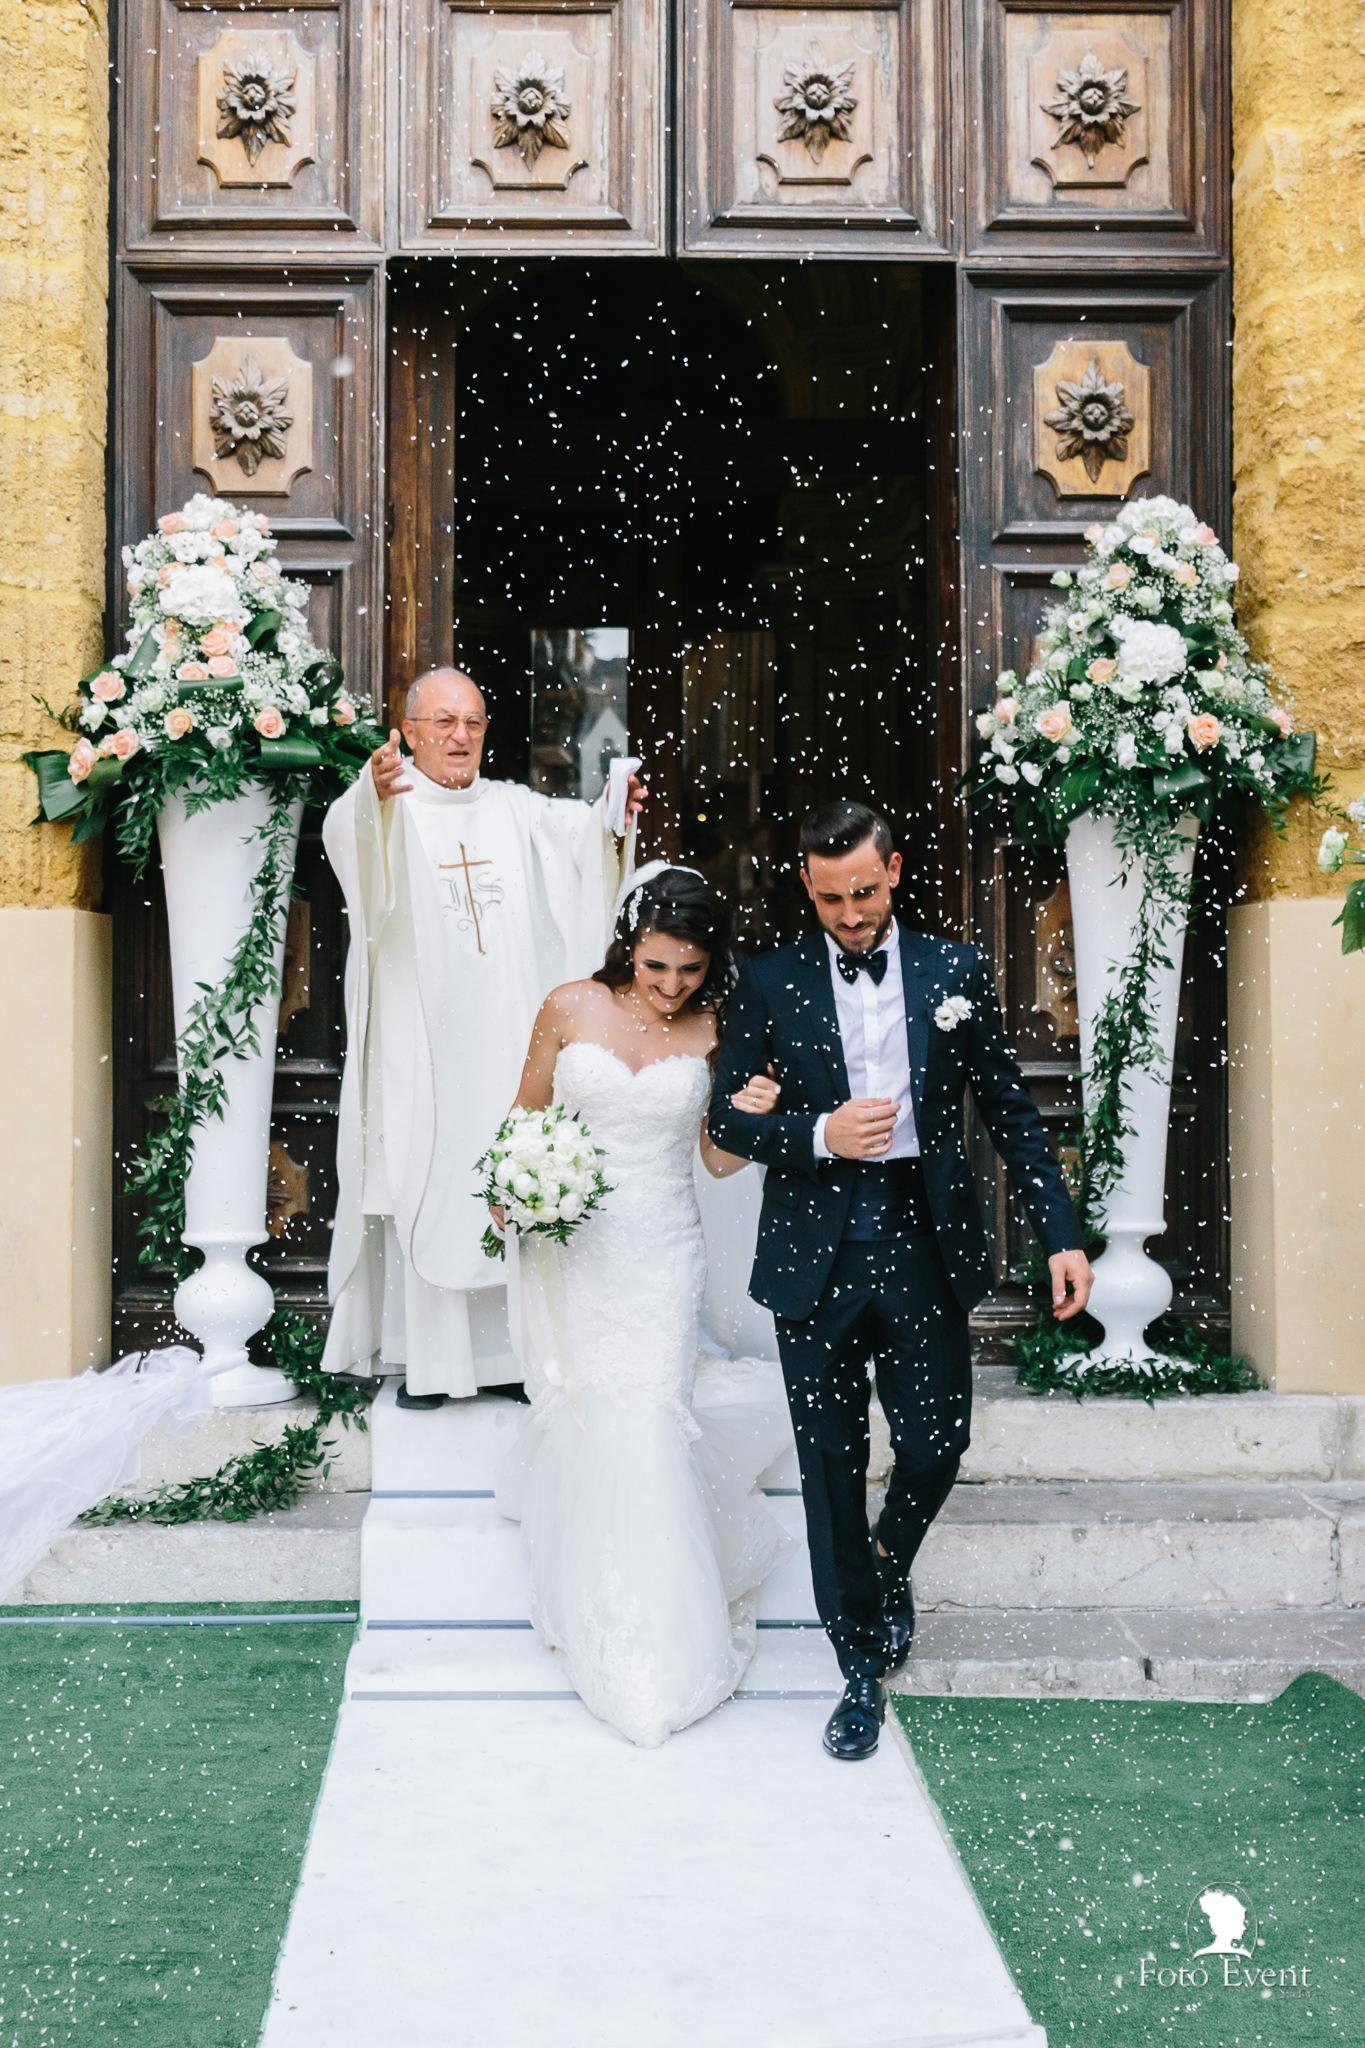 036-2019-08-31-Matrimonio-Serena-e-Saverio-Tarantino-5DE-1237